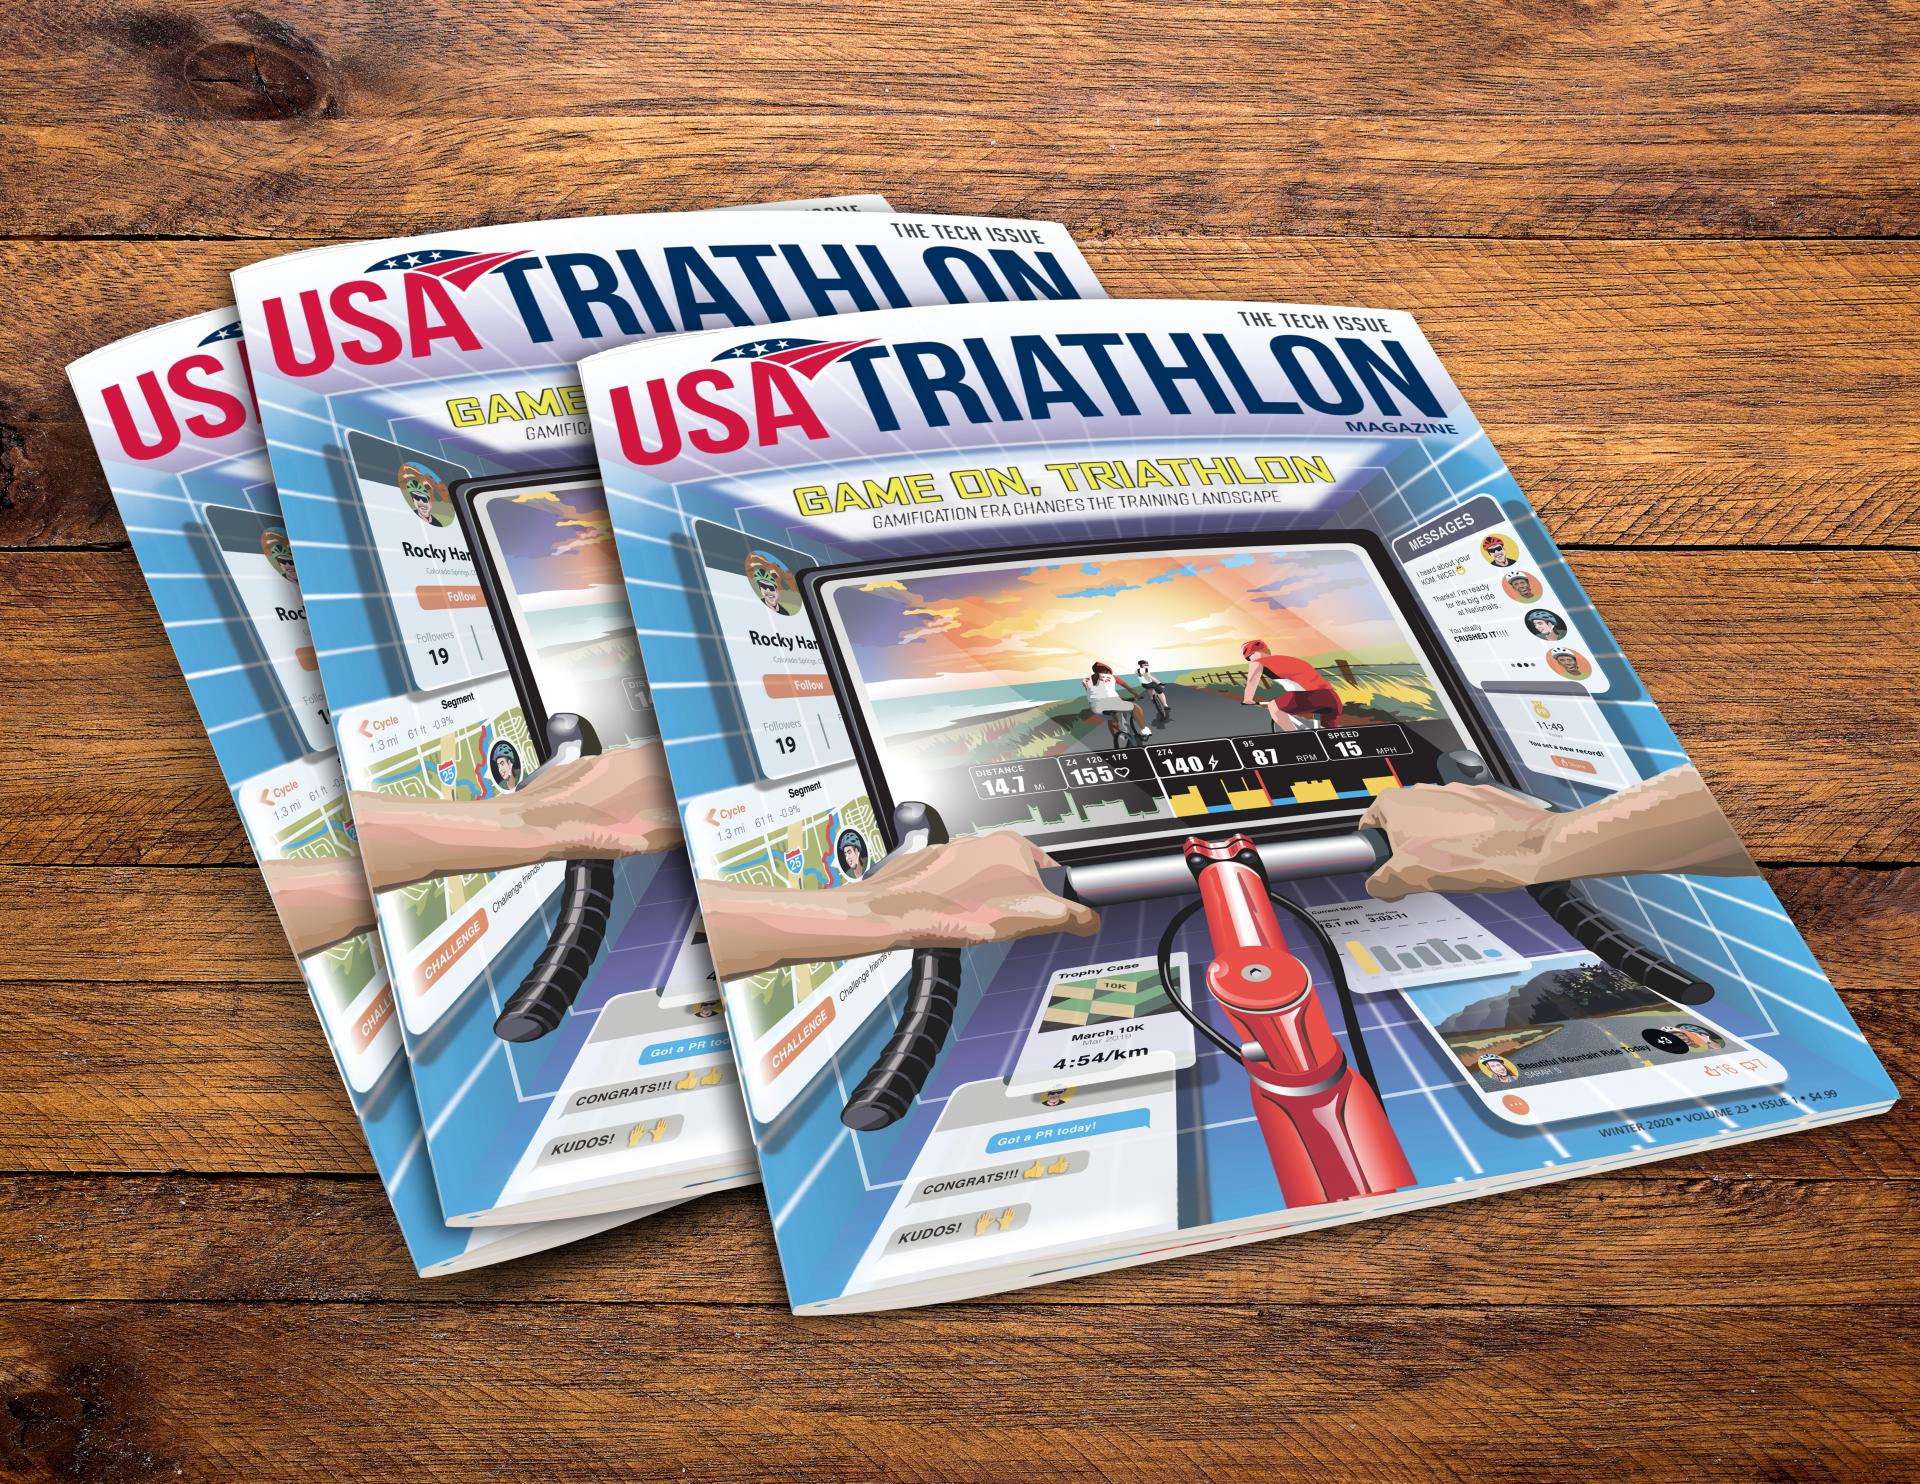 Magazine covers, USA Triathlon